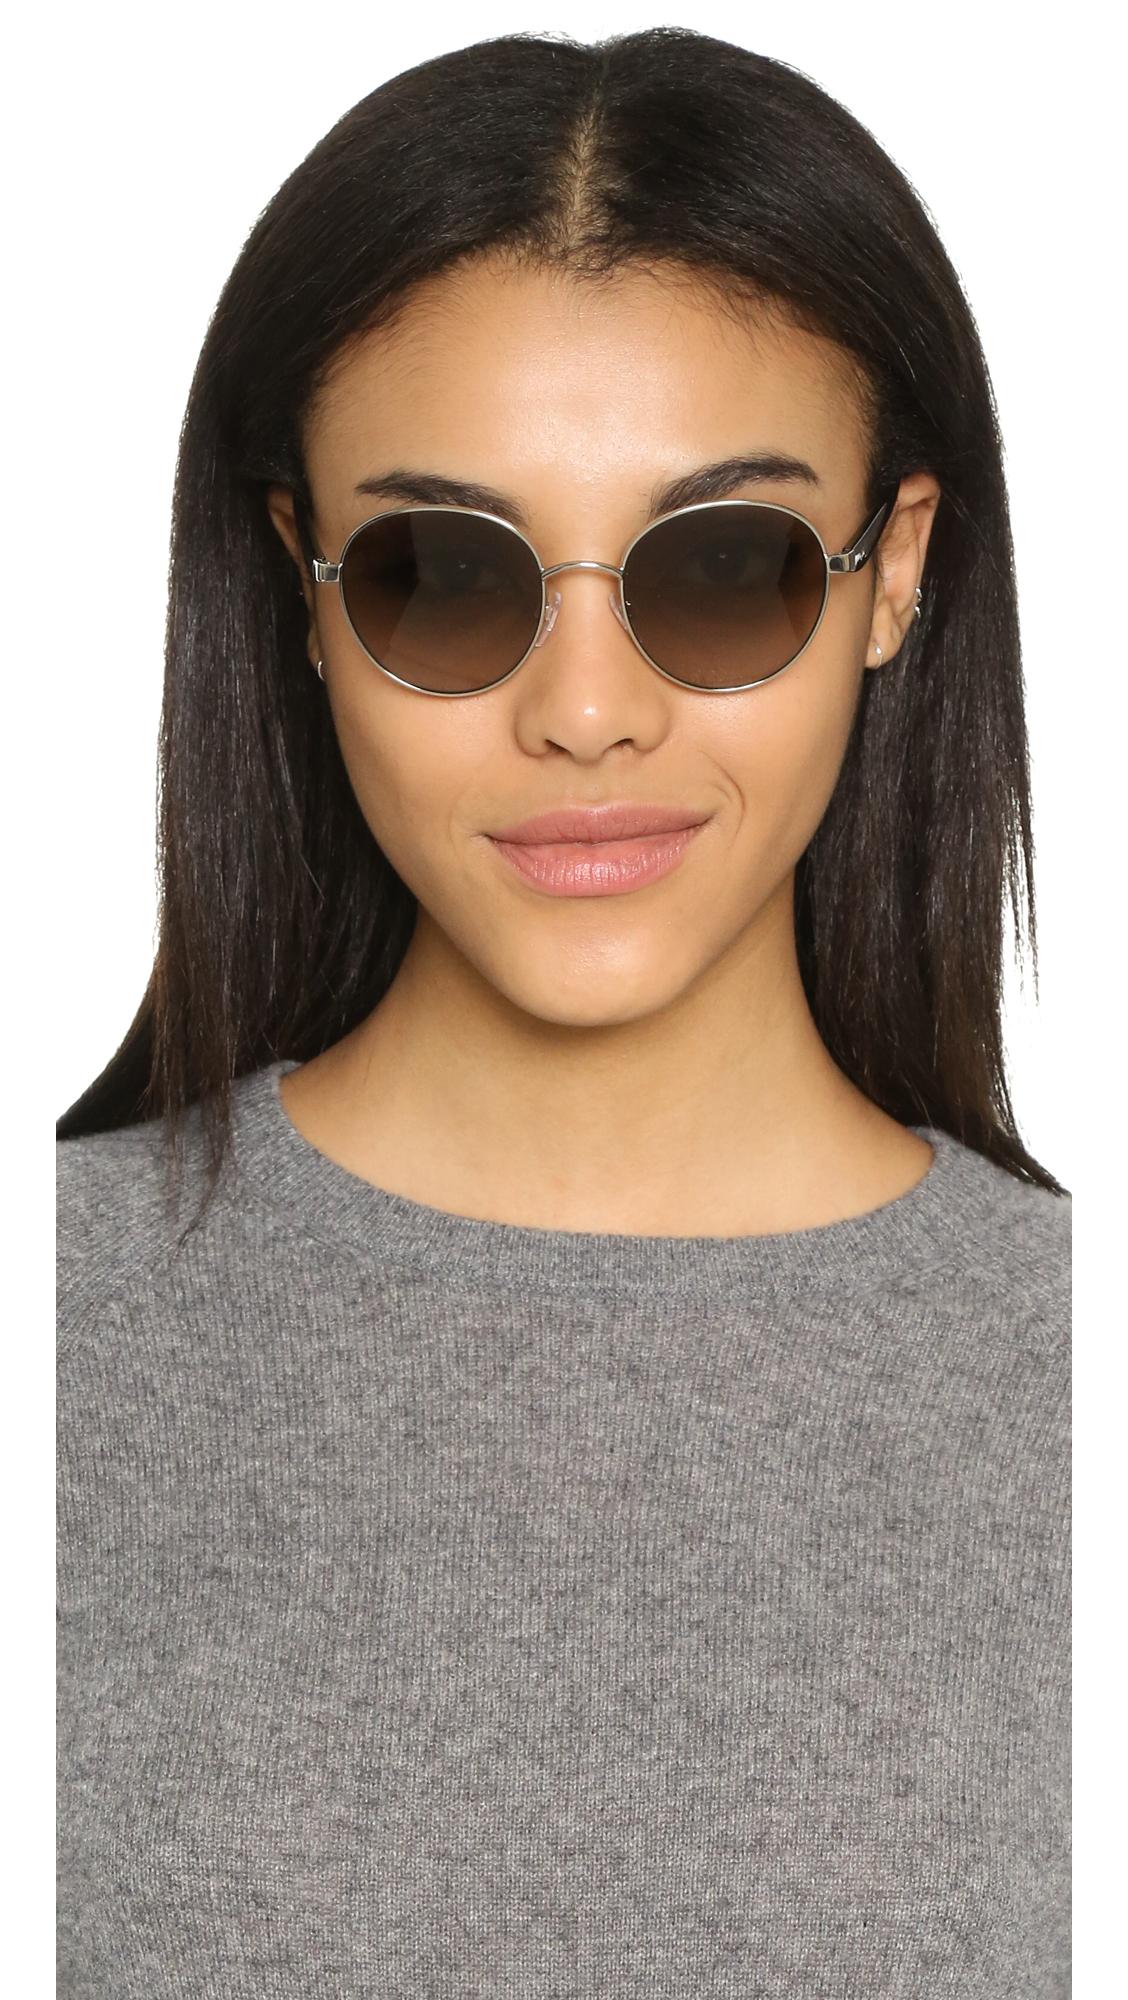 Michael Kors Adrianna Sunglasses  michael kors sa iii sunglasses in metallic lyst